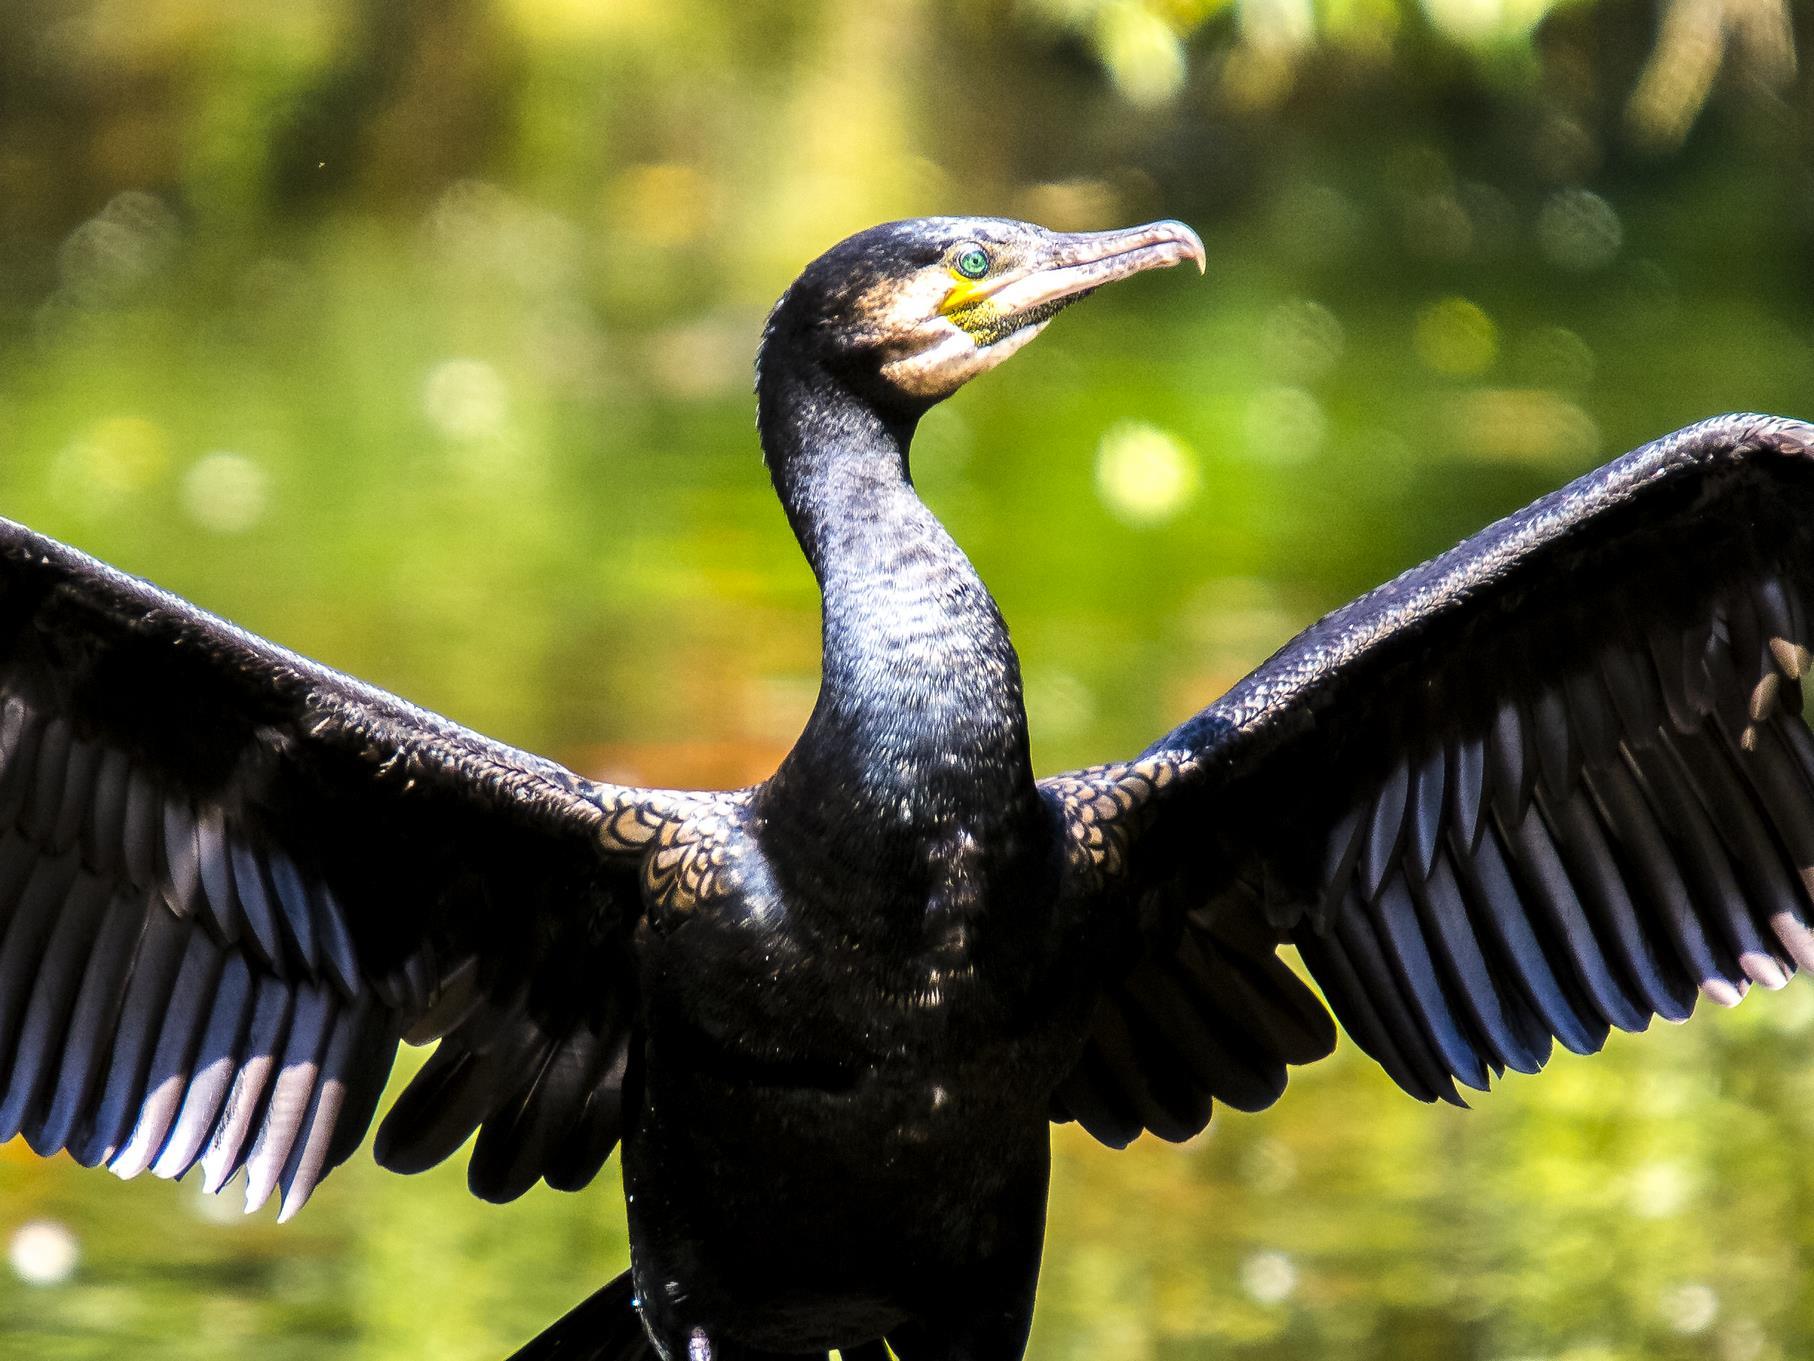 Ein Kormoran trocknet seine Flügel.